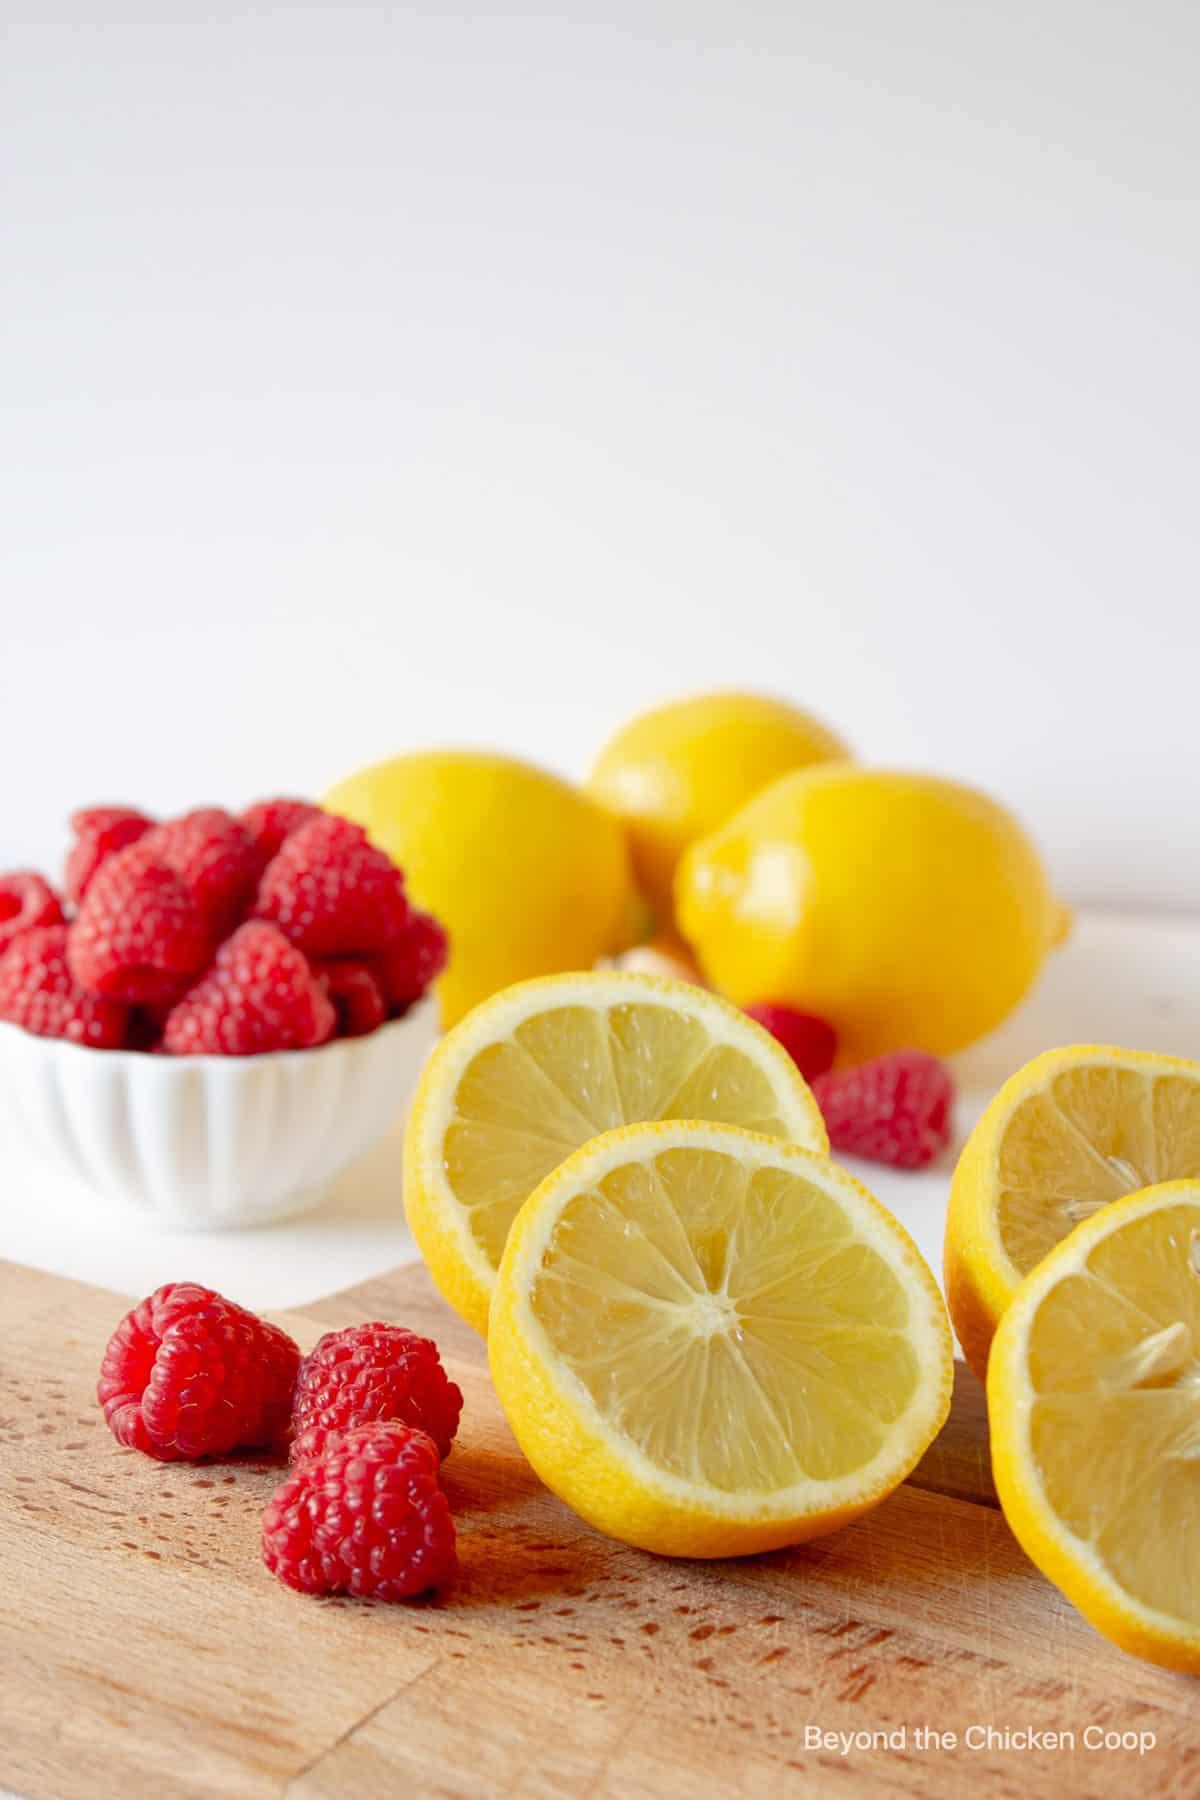 Fresh lemons and raspberries on a wooden board.